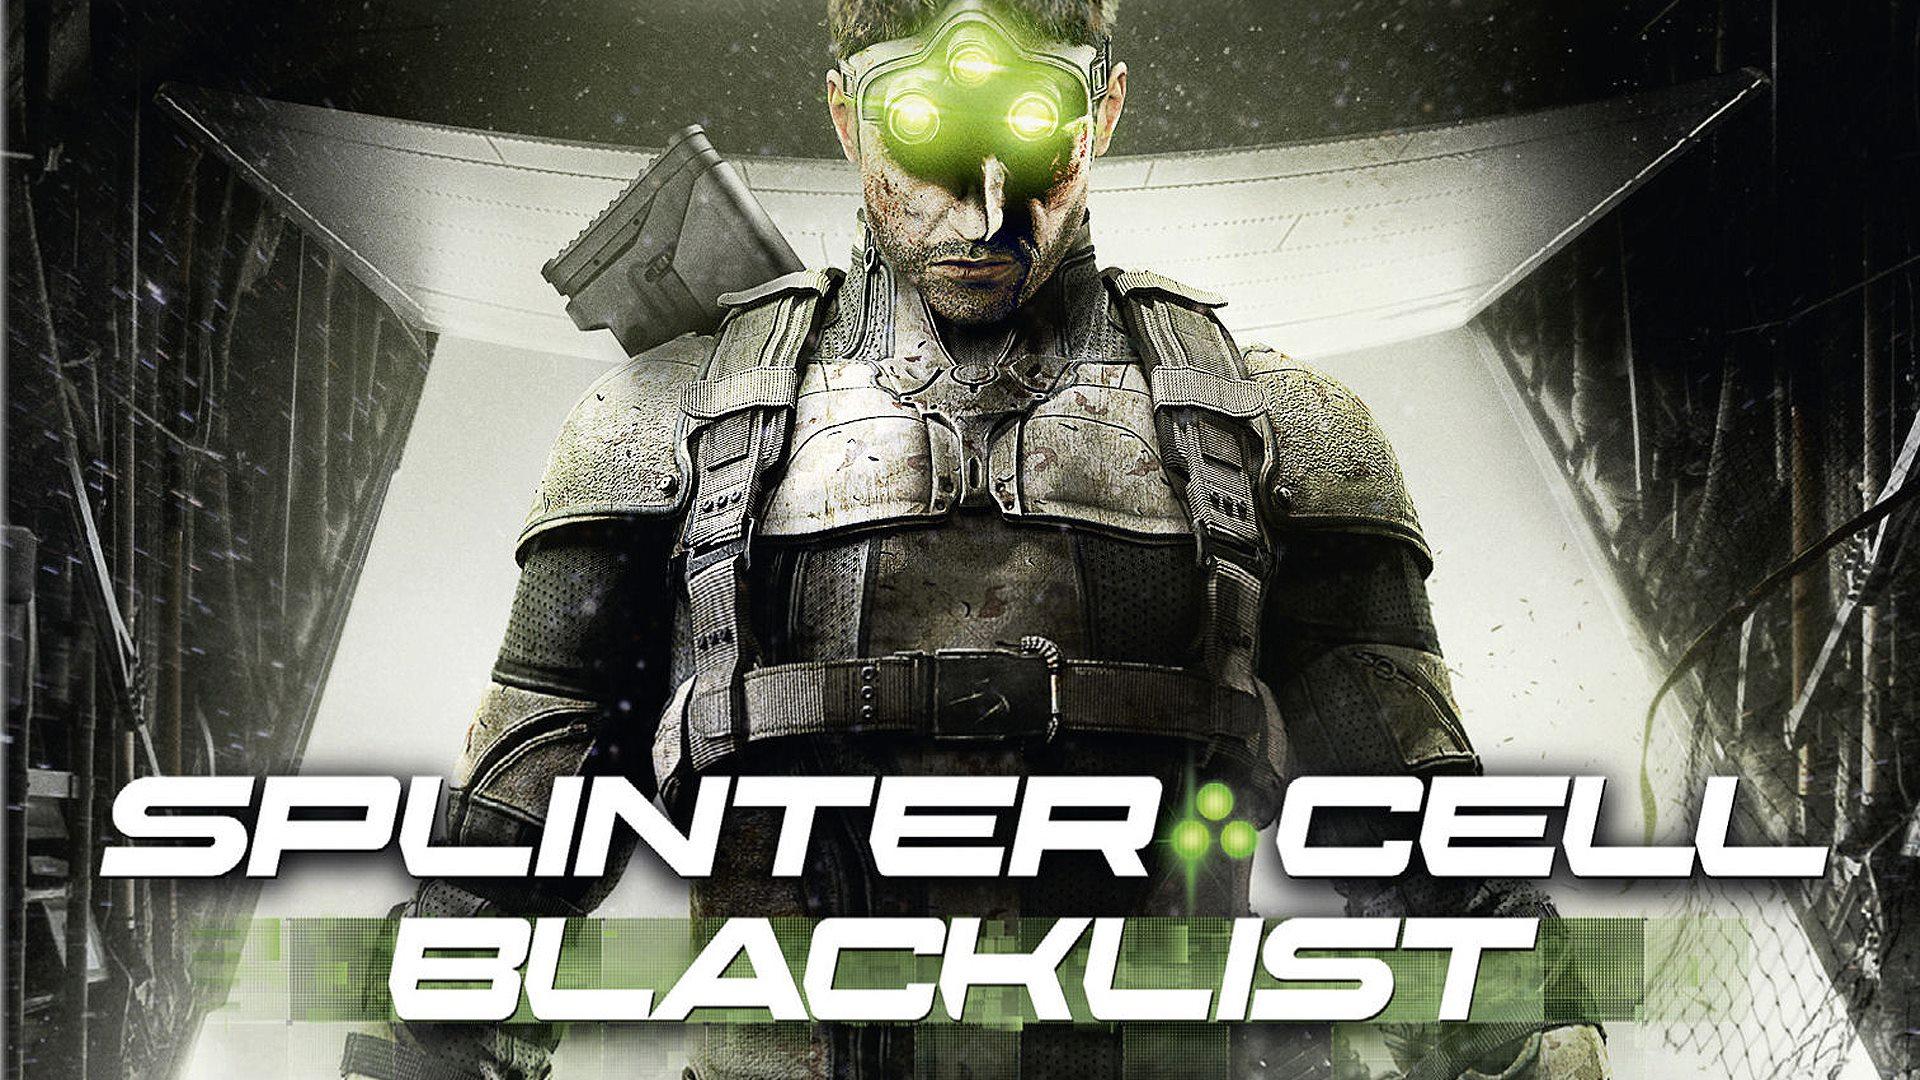 PN Review: Splinter Cell Blacklist